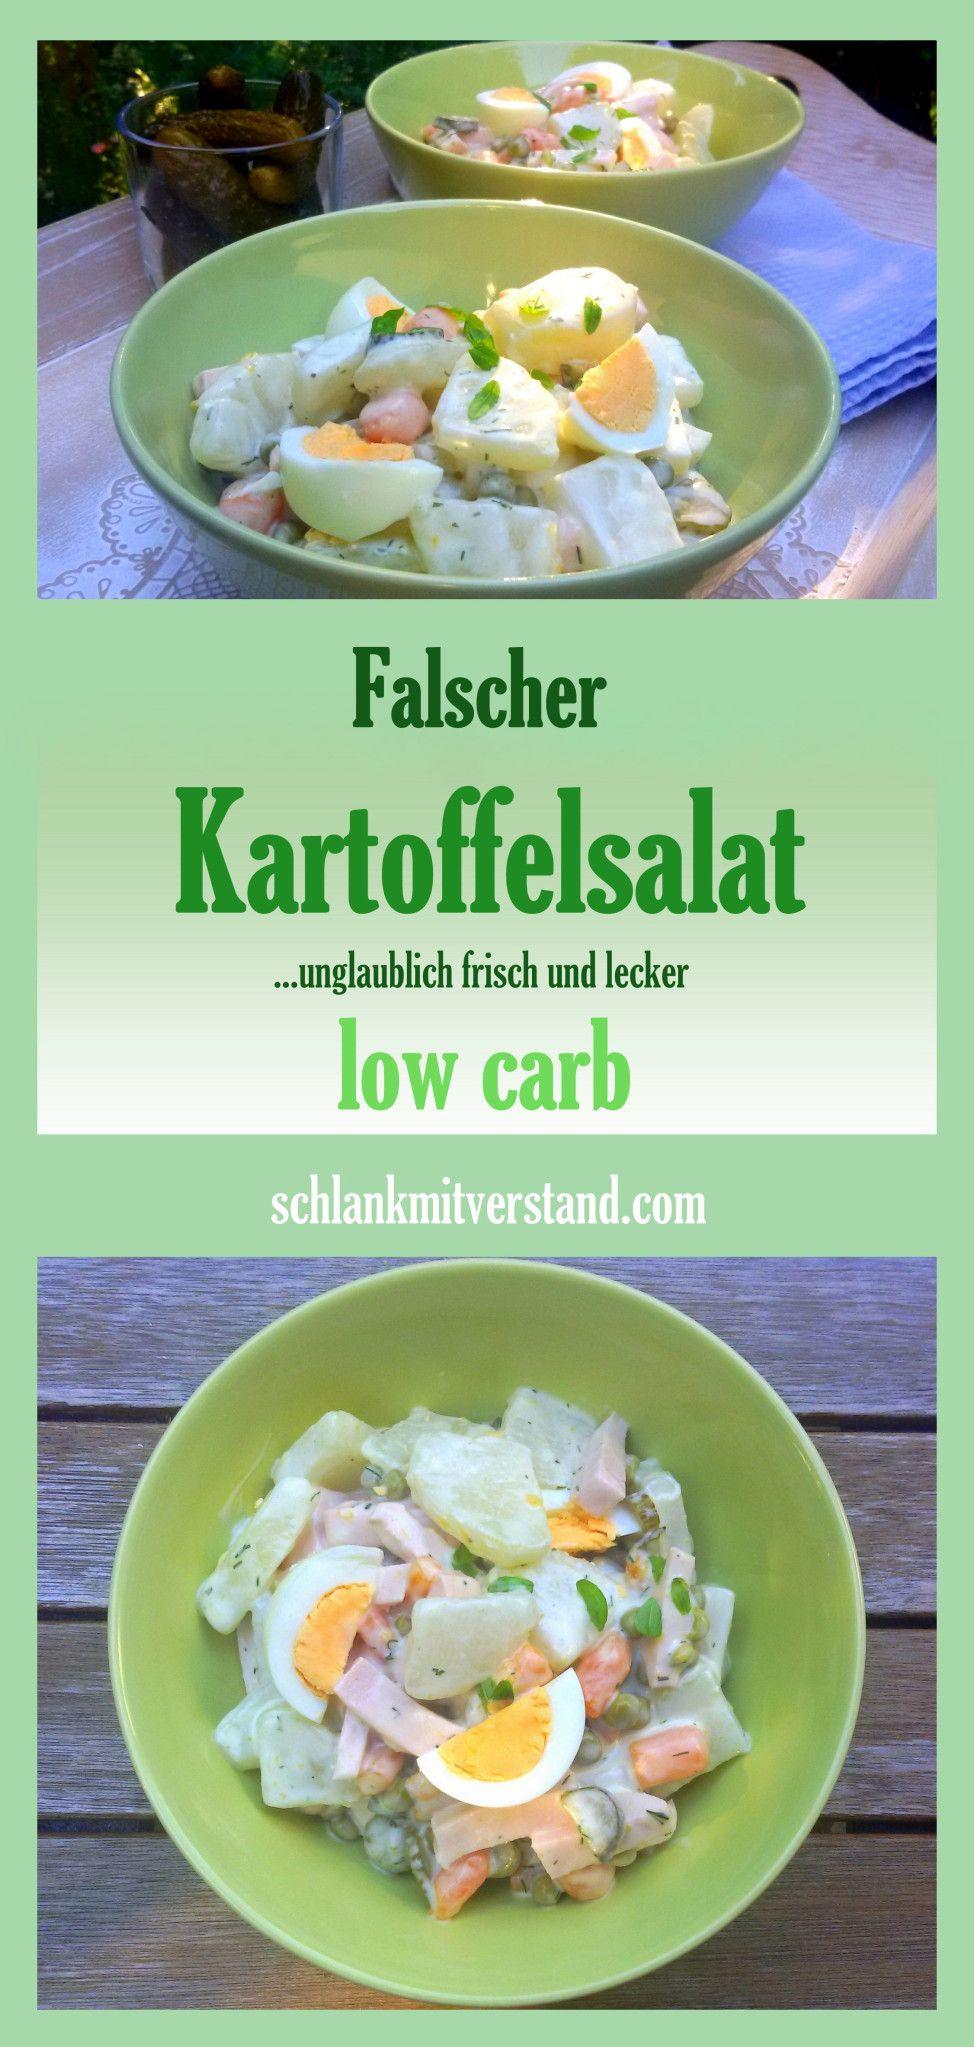 Falscher Kartoffelsalat low carb #nocarbdiets